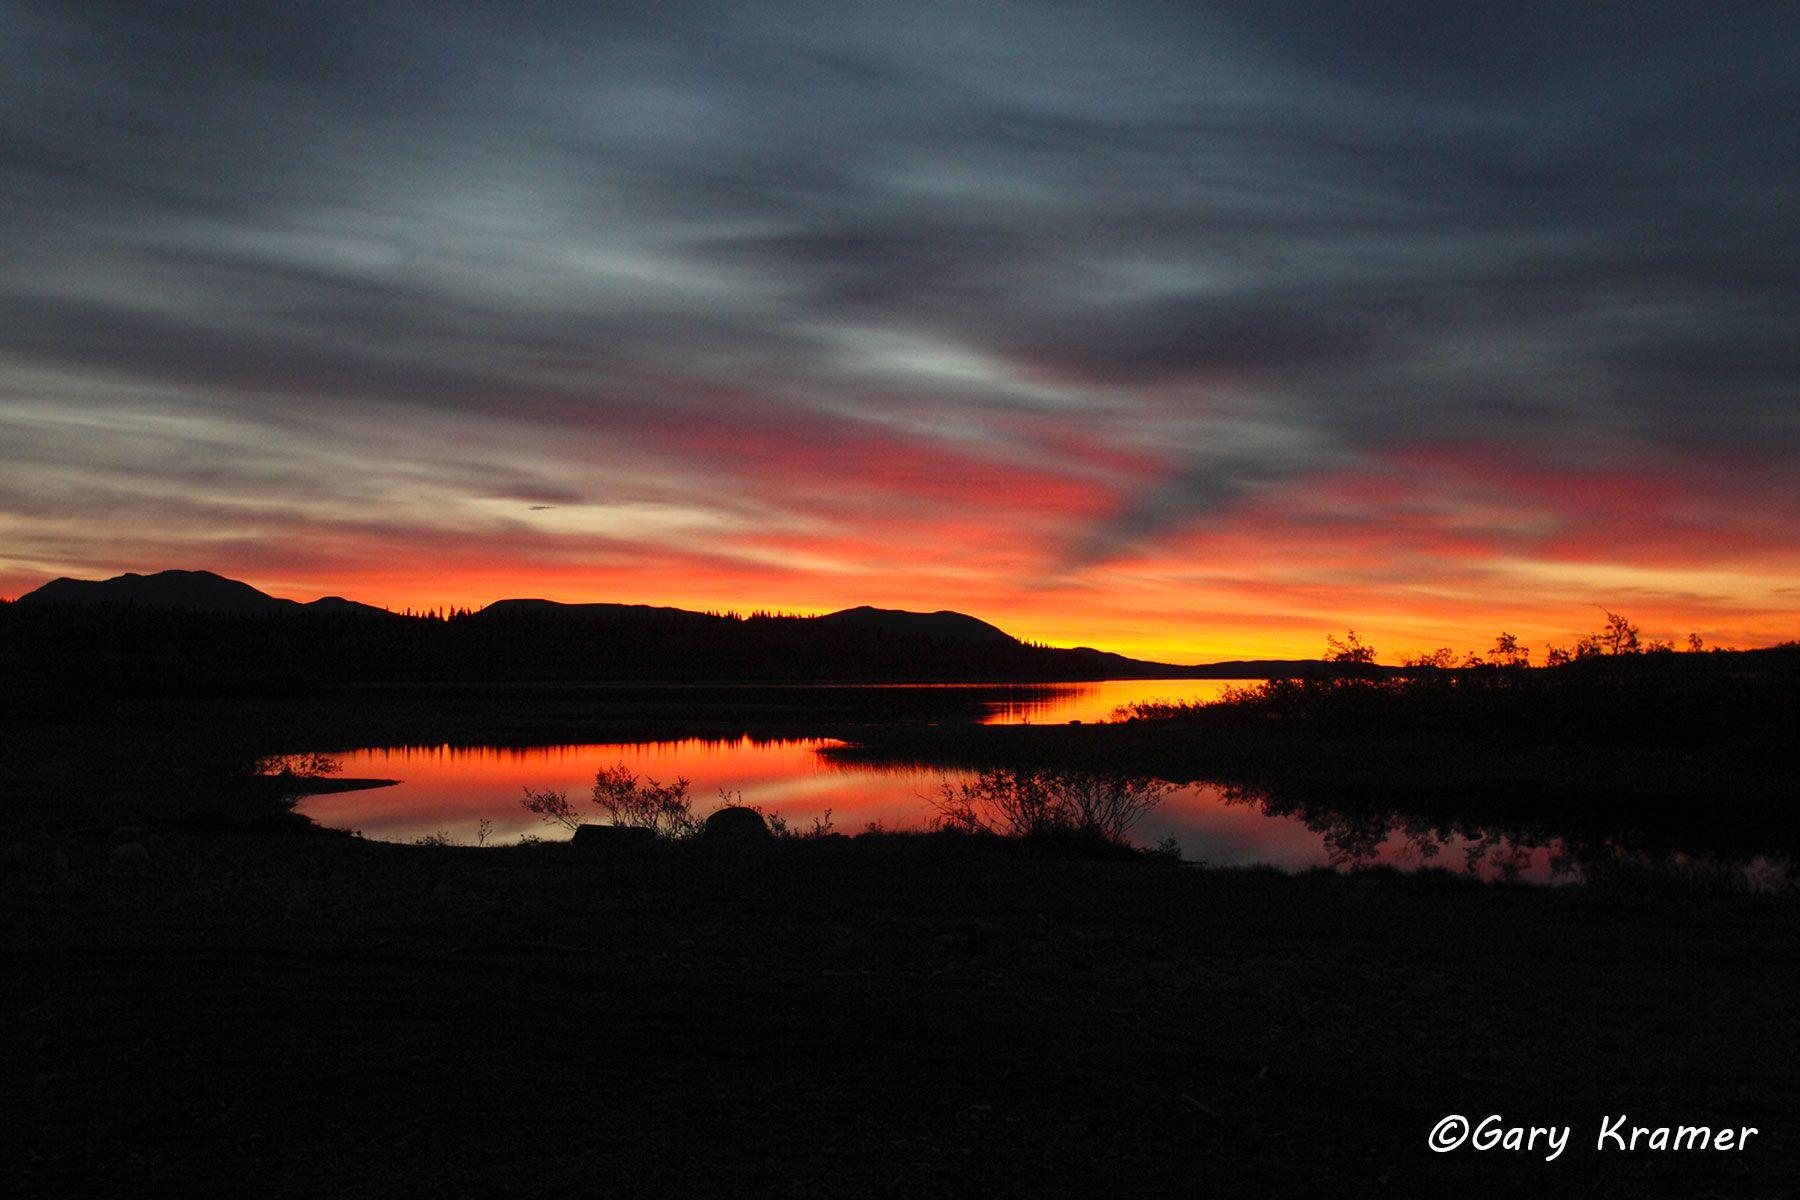 Sunrise/sunset, Lake/Mountains - GSSlm#001d